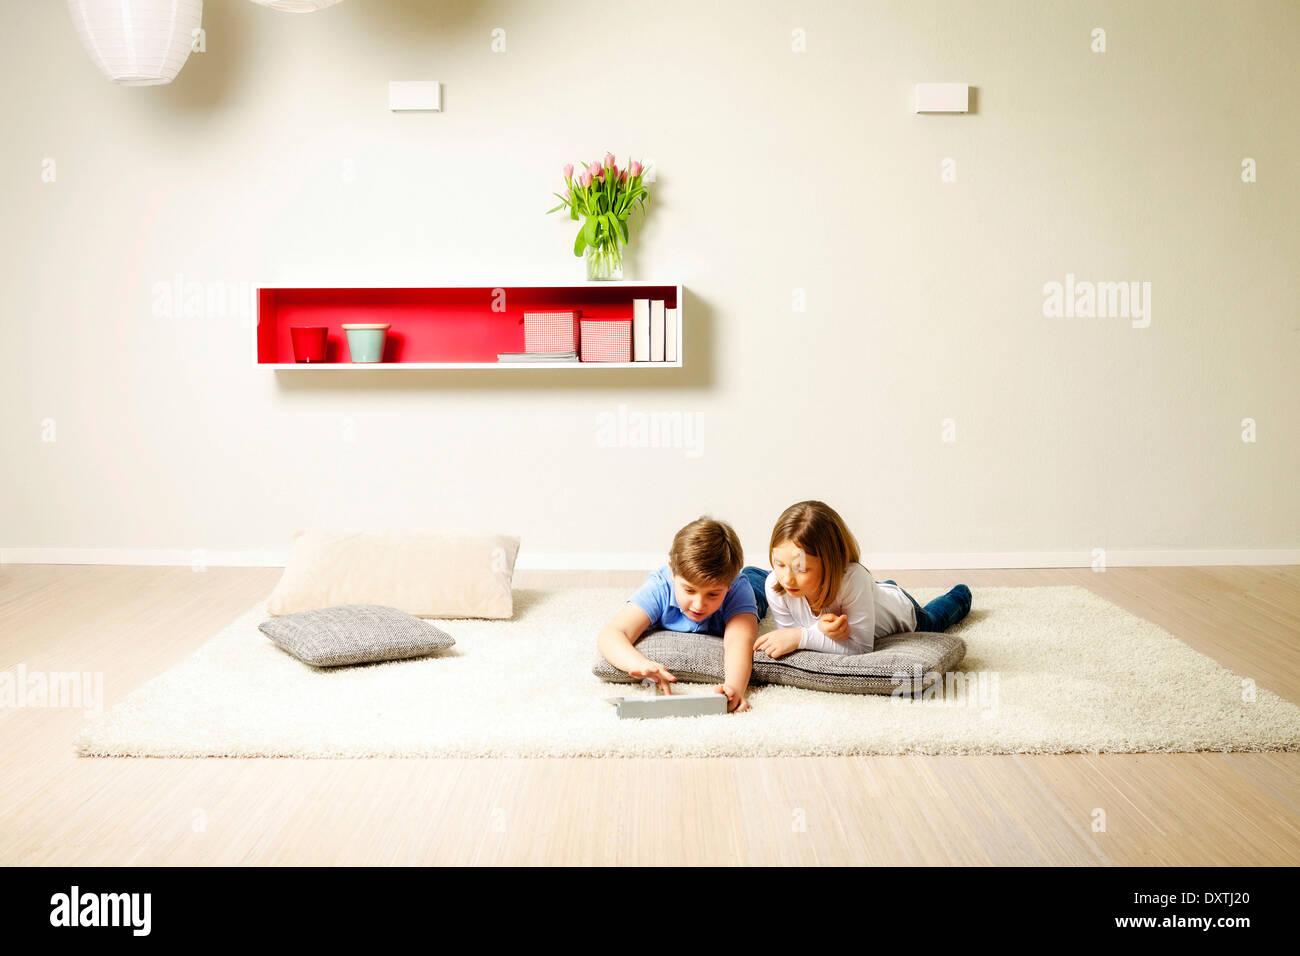 Children using computer at home, Munich, Bavaria, Germany - Stock Image